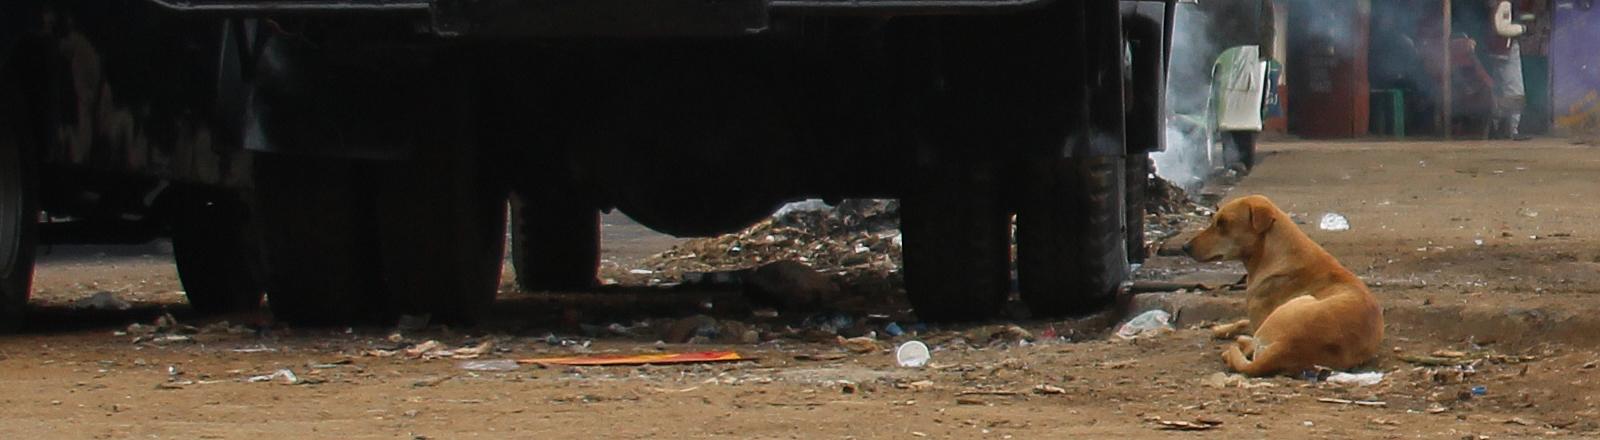 Kenai, Nairobi, Stadtteil Kibera, Autowerkstatt